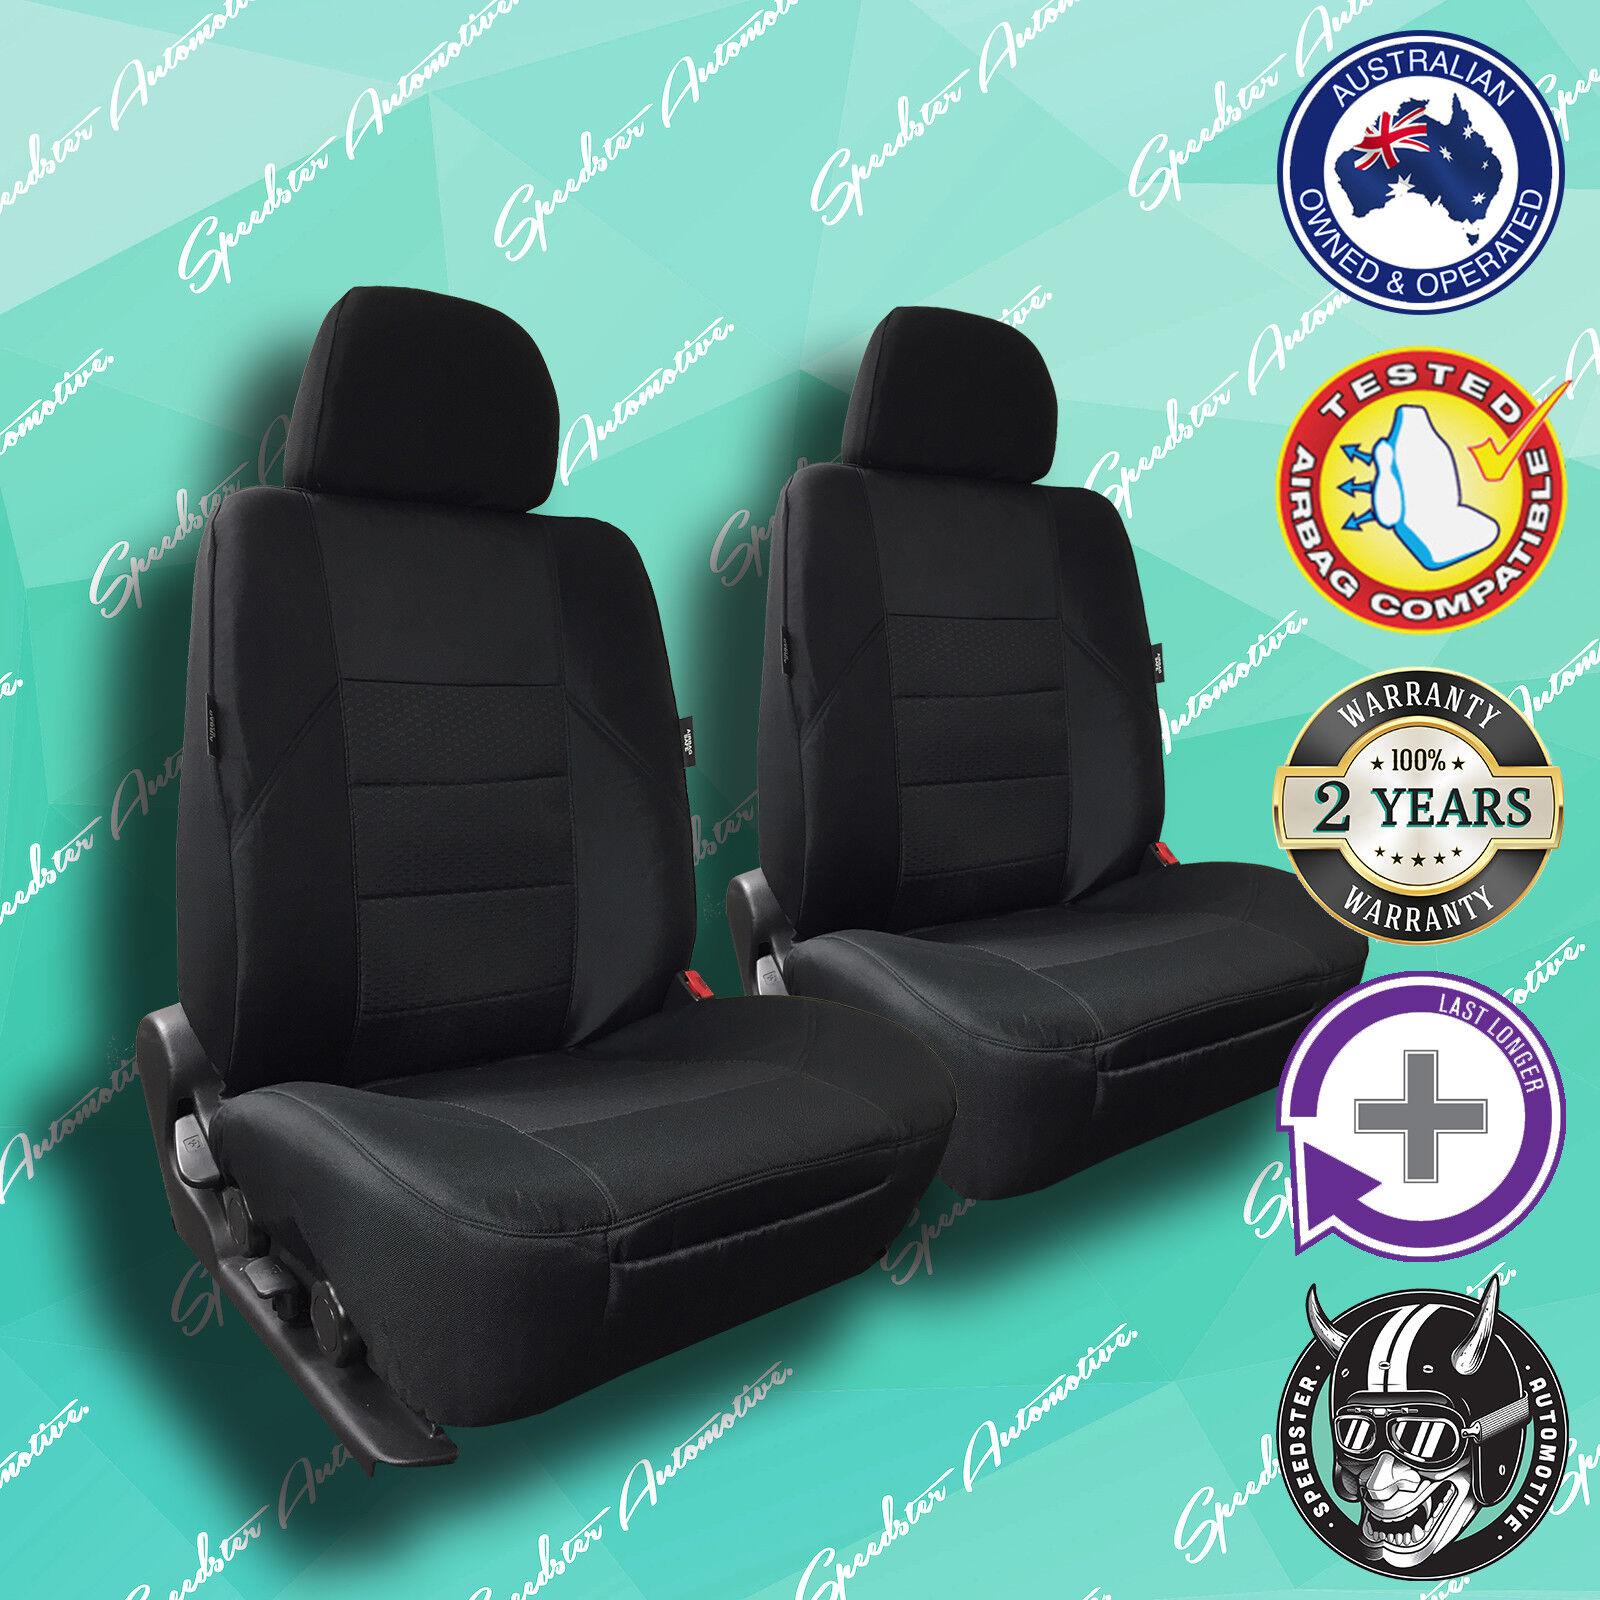 HIGH QUALITY ELEGANT JACQUARD MITSUBISHI CHALLENGER BLACK FRONT CAR SEAT COVERS